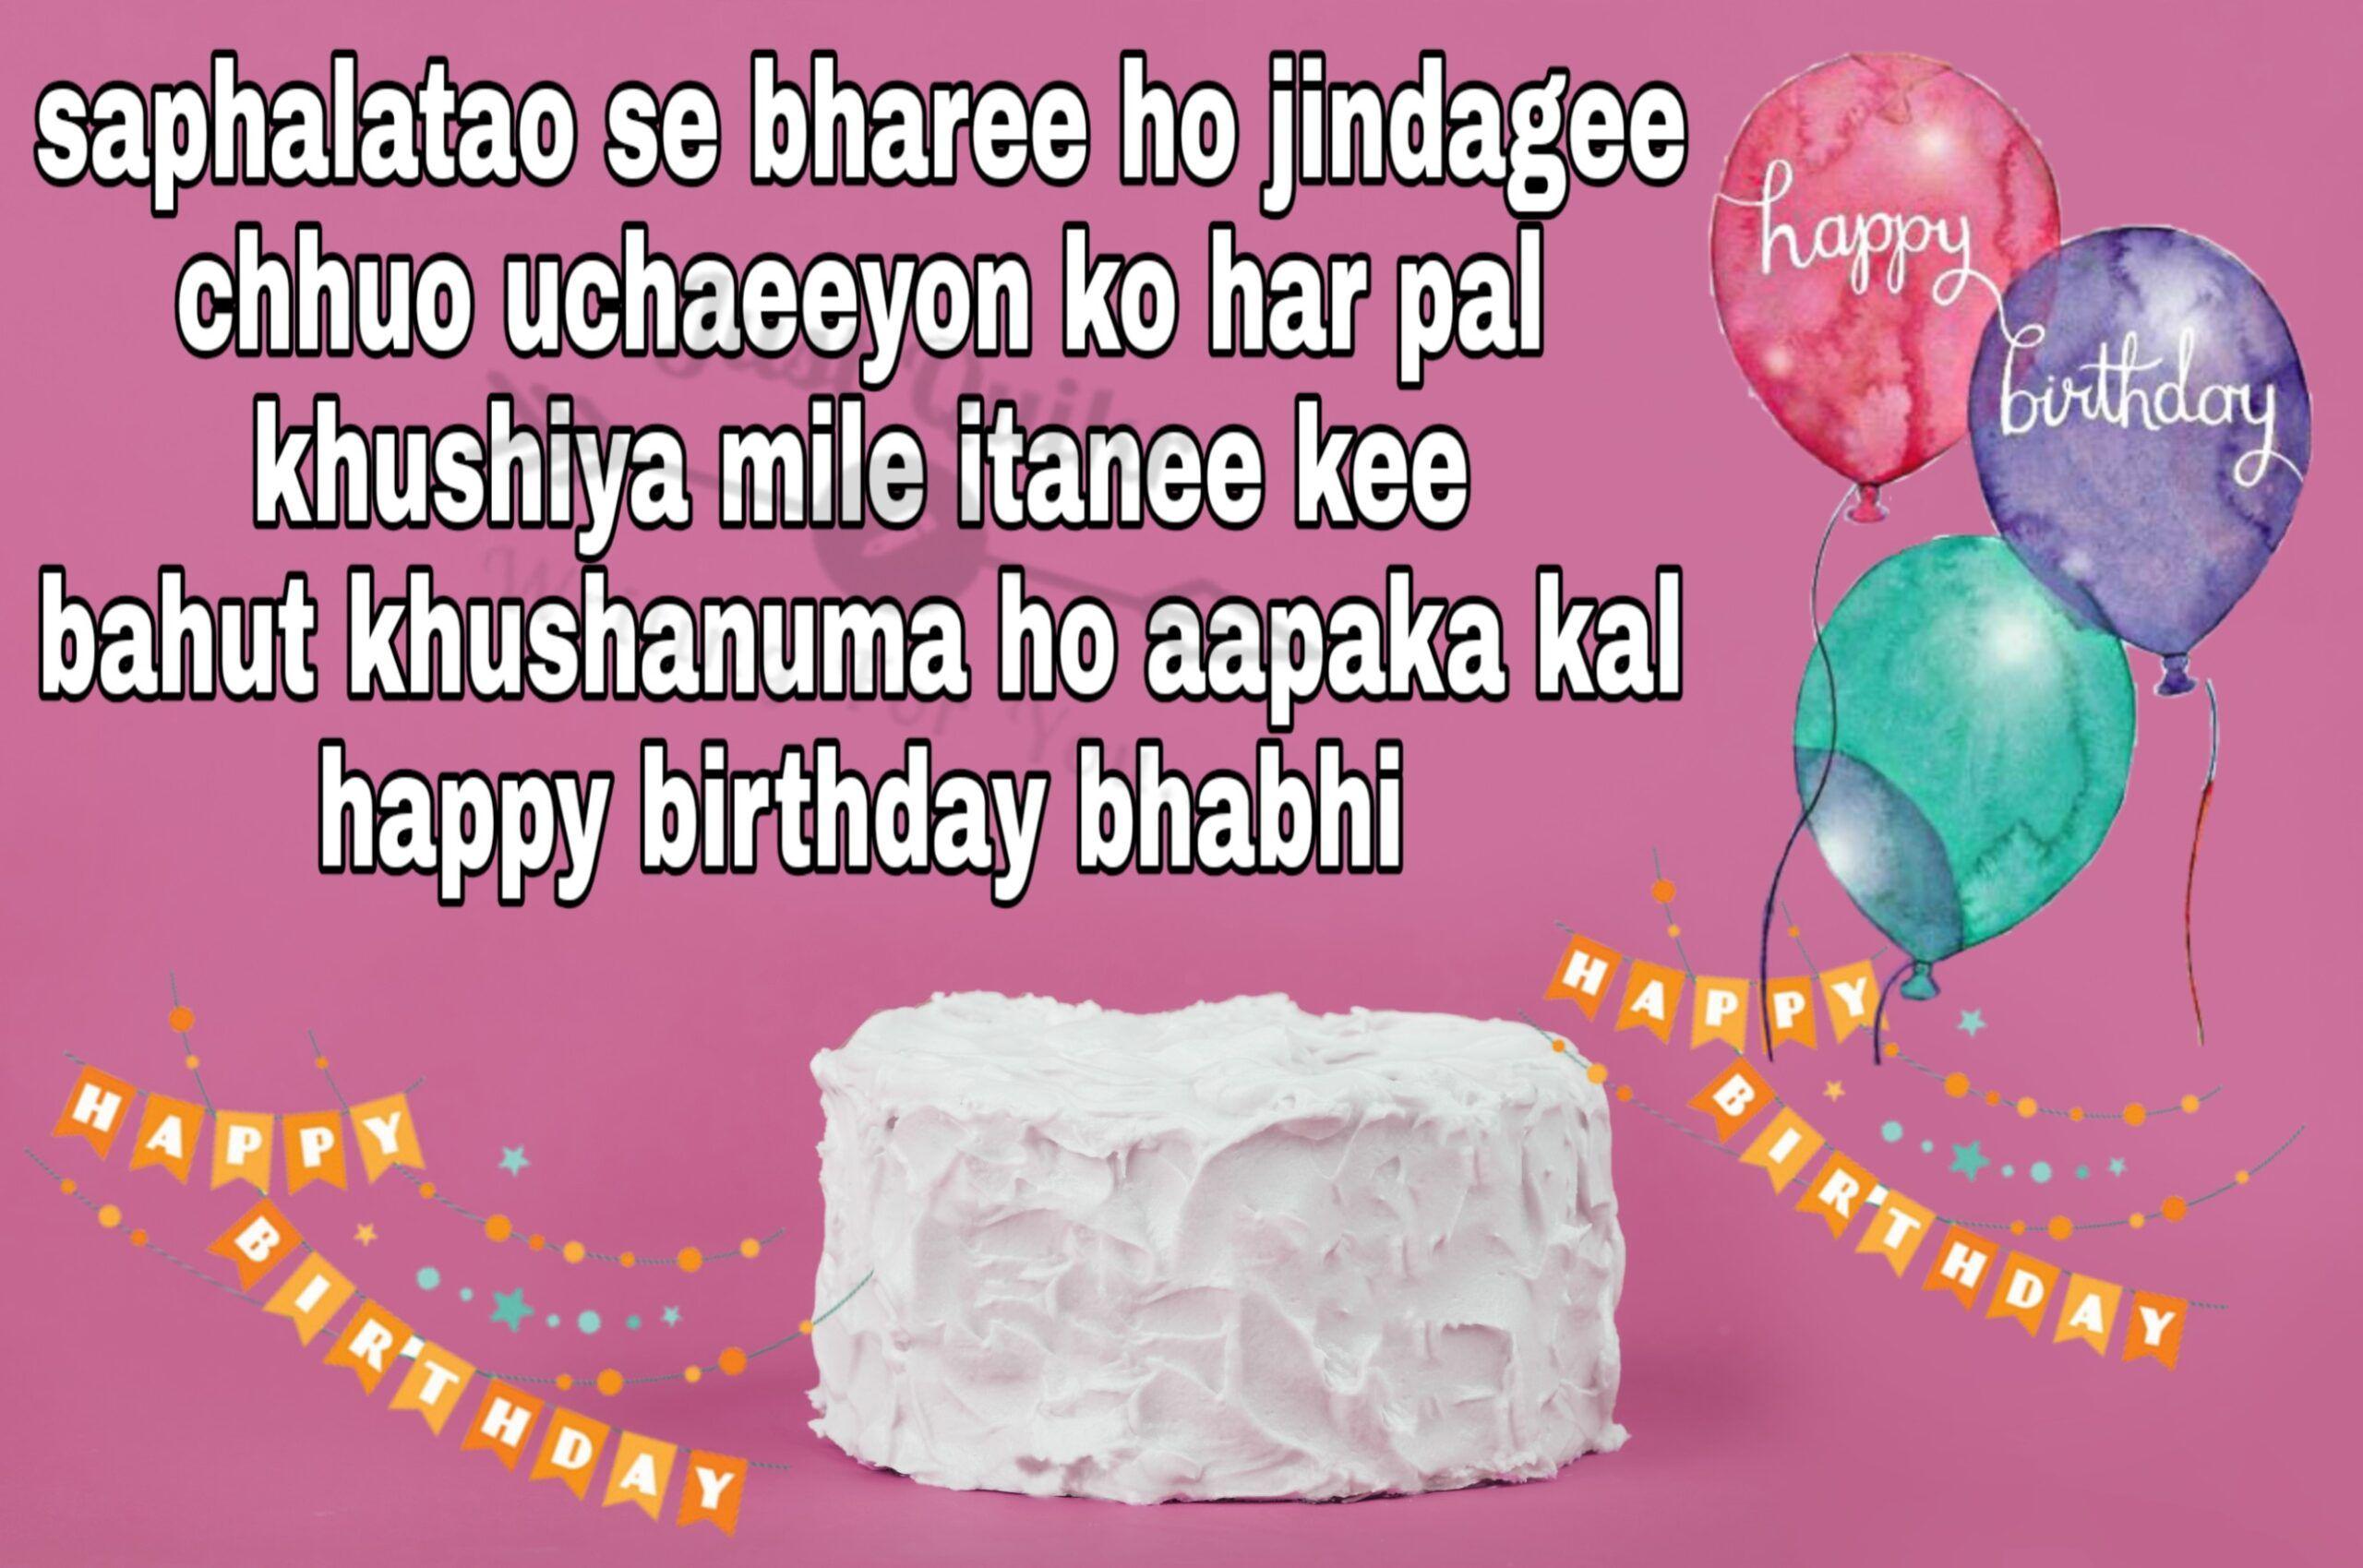 Top 10 Special Unique Happy Birthday Cake Hd Pics Images For Bhabhi Ji J U S T Q U Happy Birthday Cakes Happy Birthday Cake Hd Happy Birthday Cake Pictures